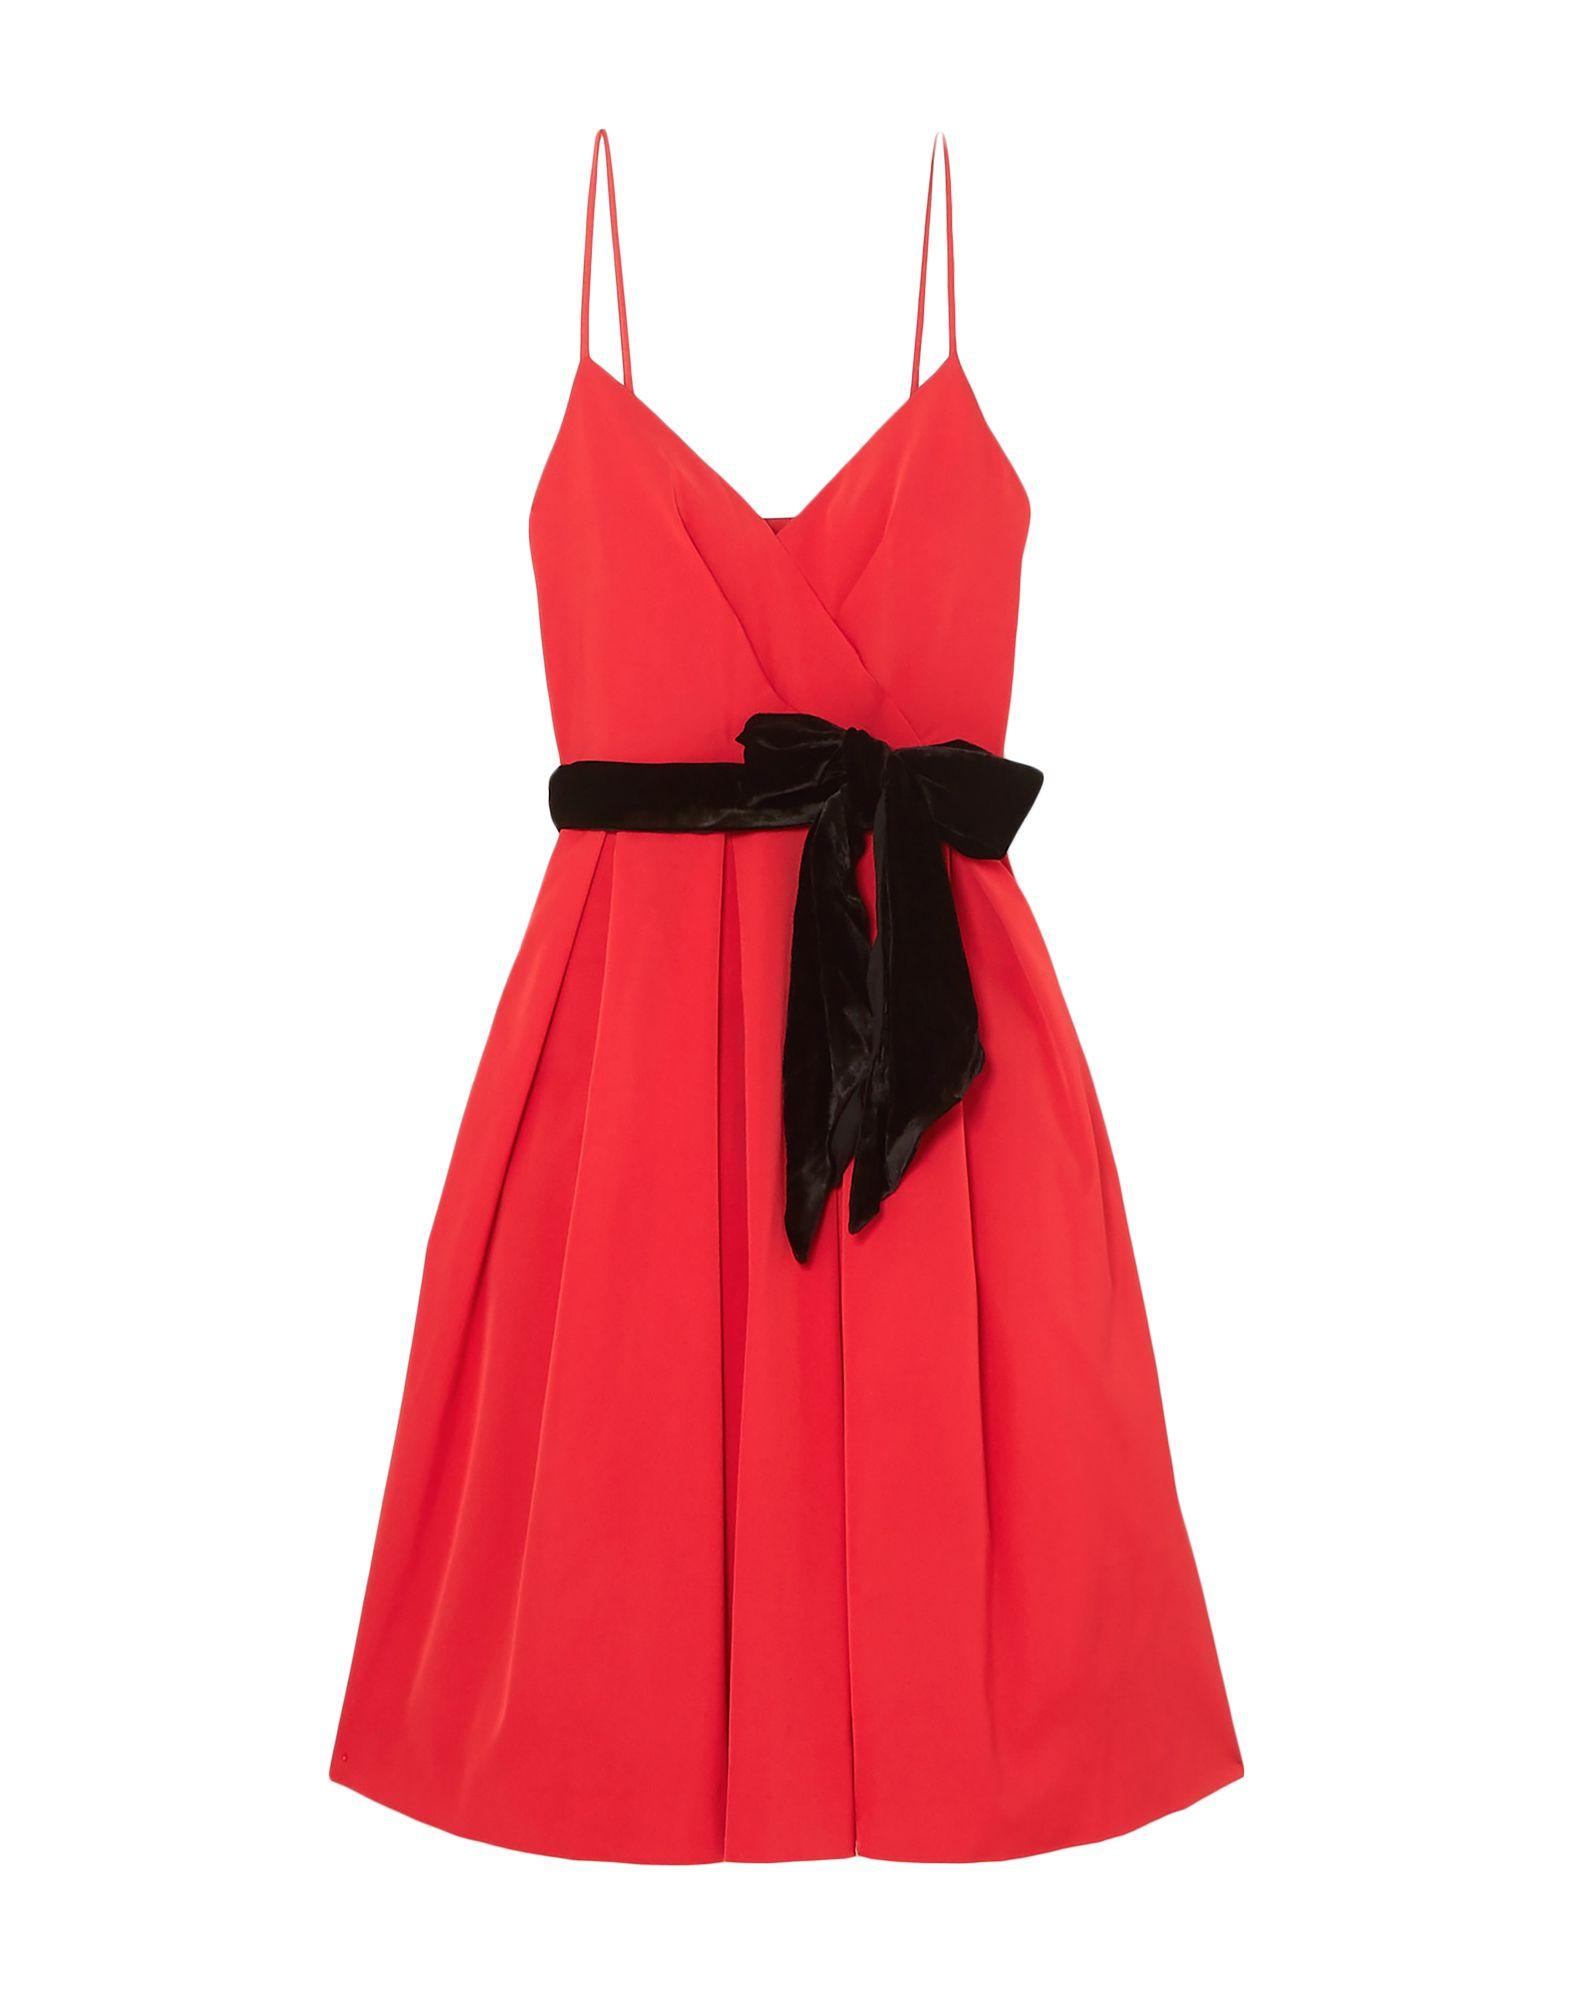 J.CREW 3/4 length dresses. grosgrain, folds, belt, basic solid color, v-neck, sleeveless, no pockets, rear closure, zipper closure, multi-layered interior, stretch. 72% Acetate, 25% Nylon, 3% Elastane